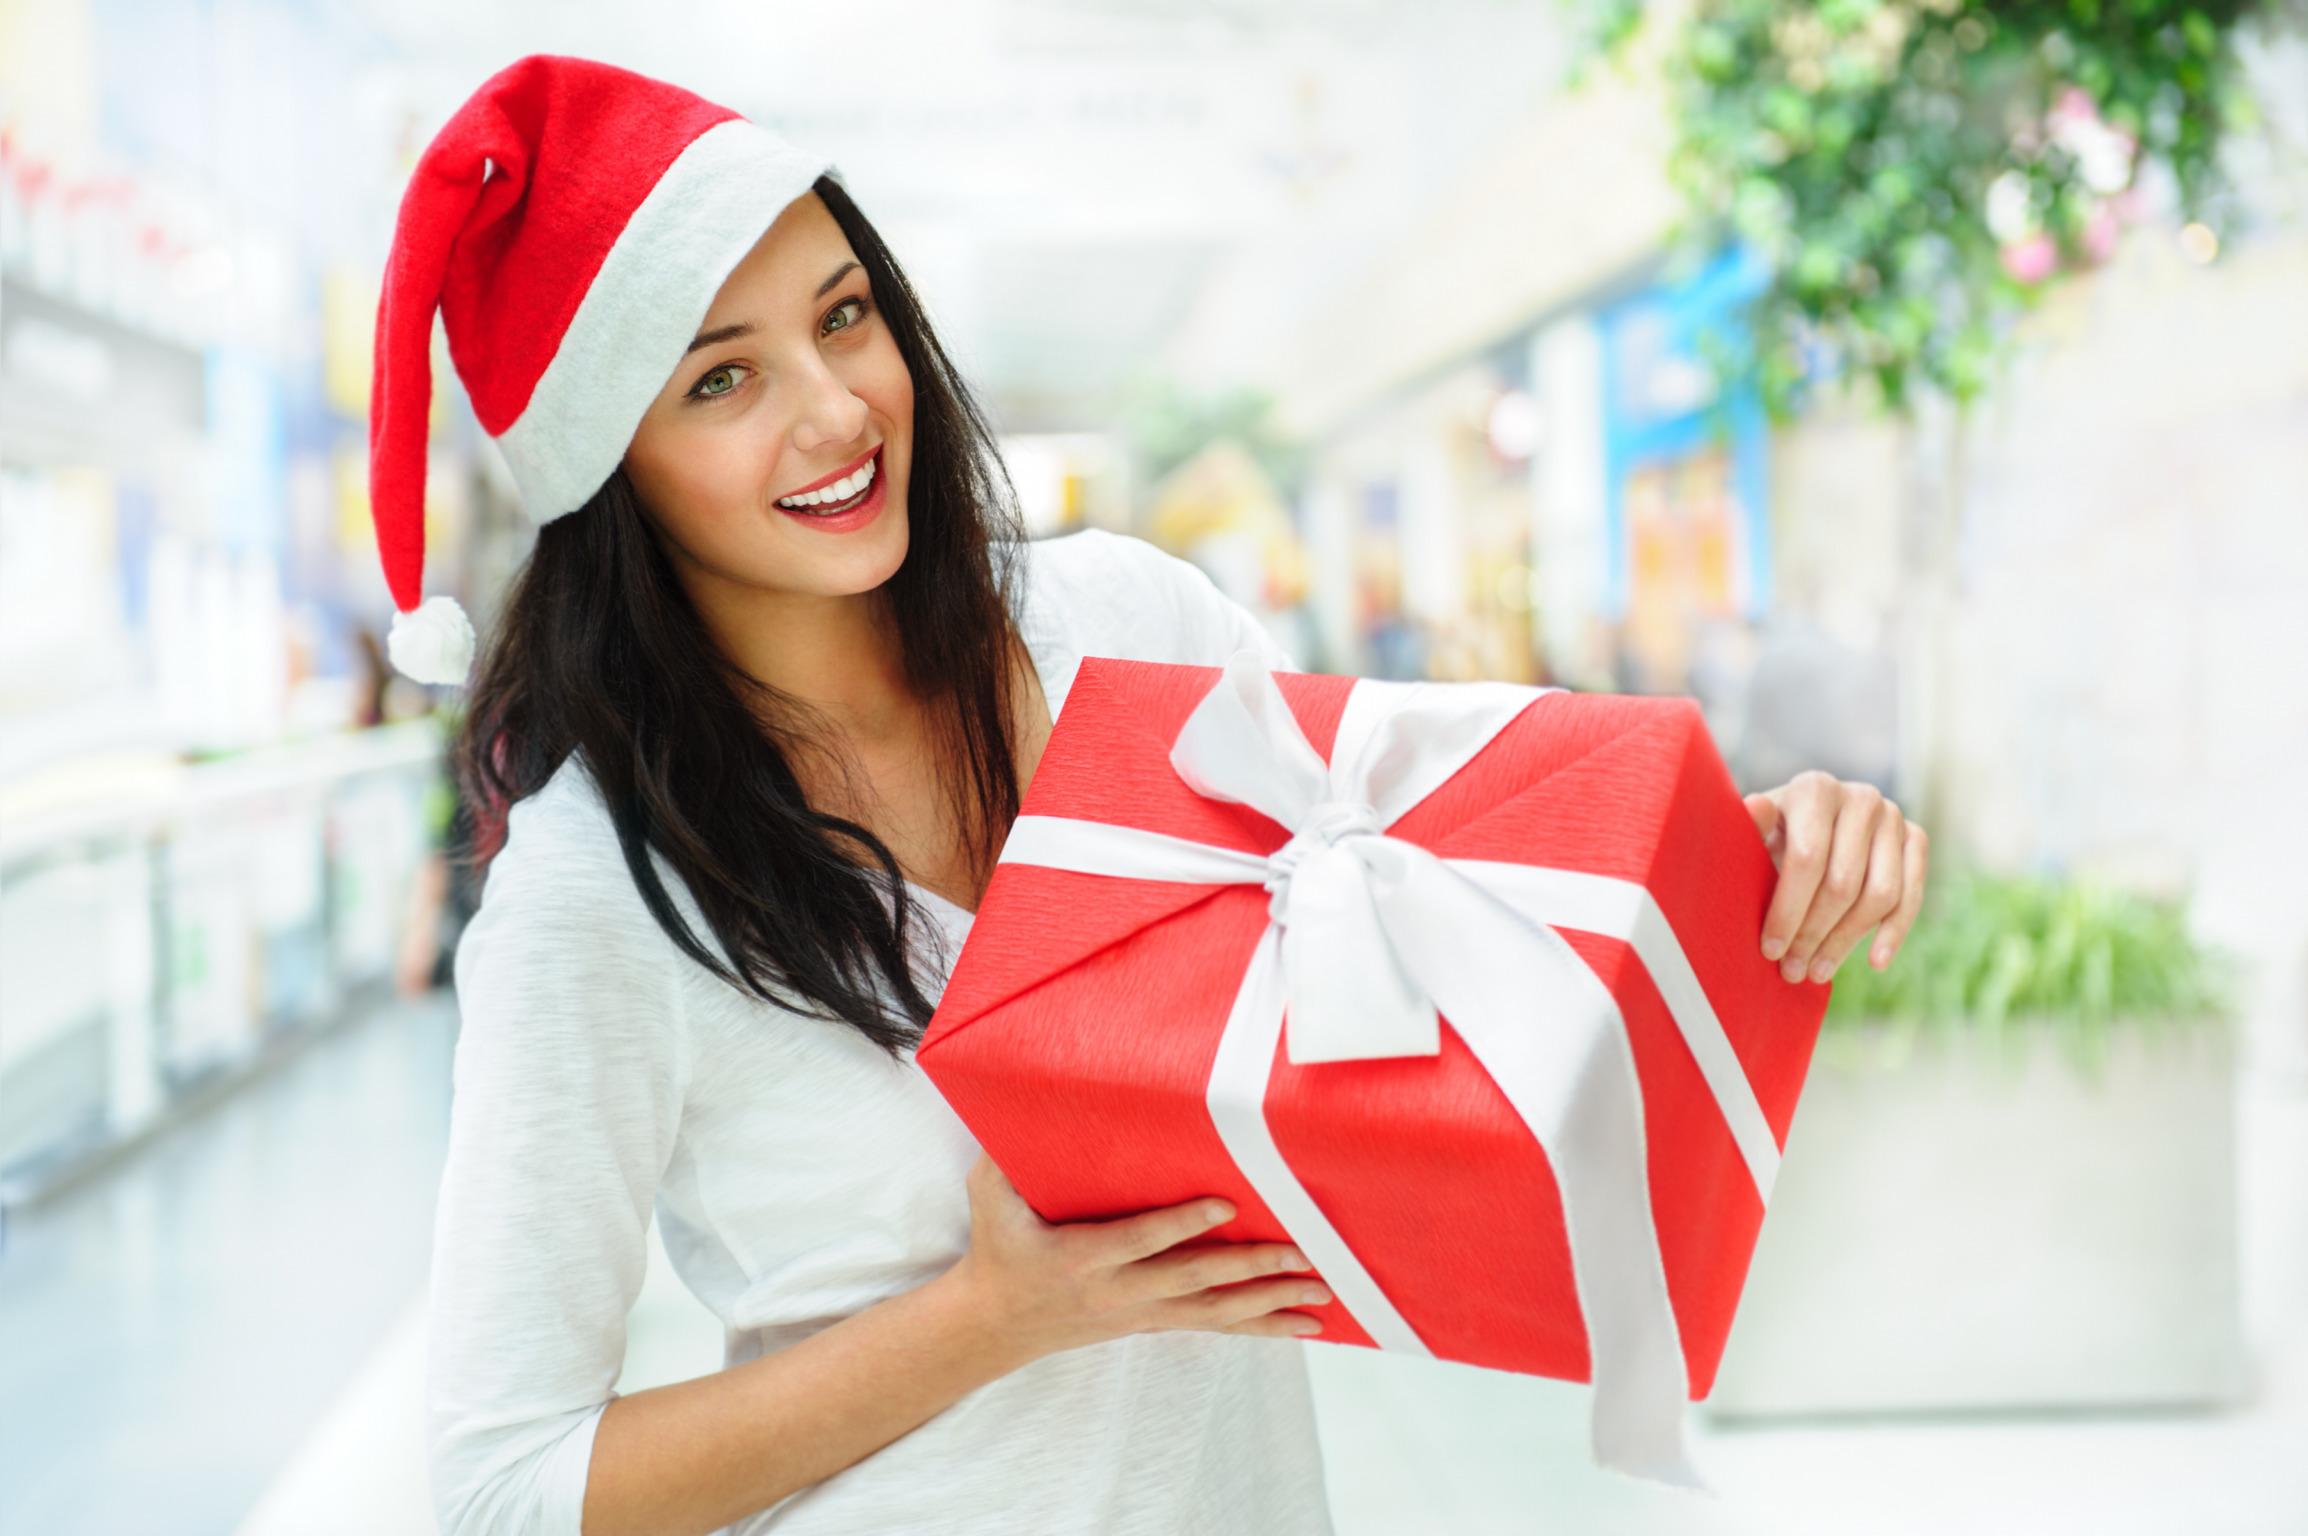 Красивое фото для девушки в подарок